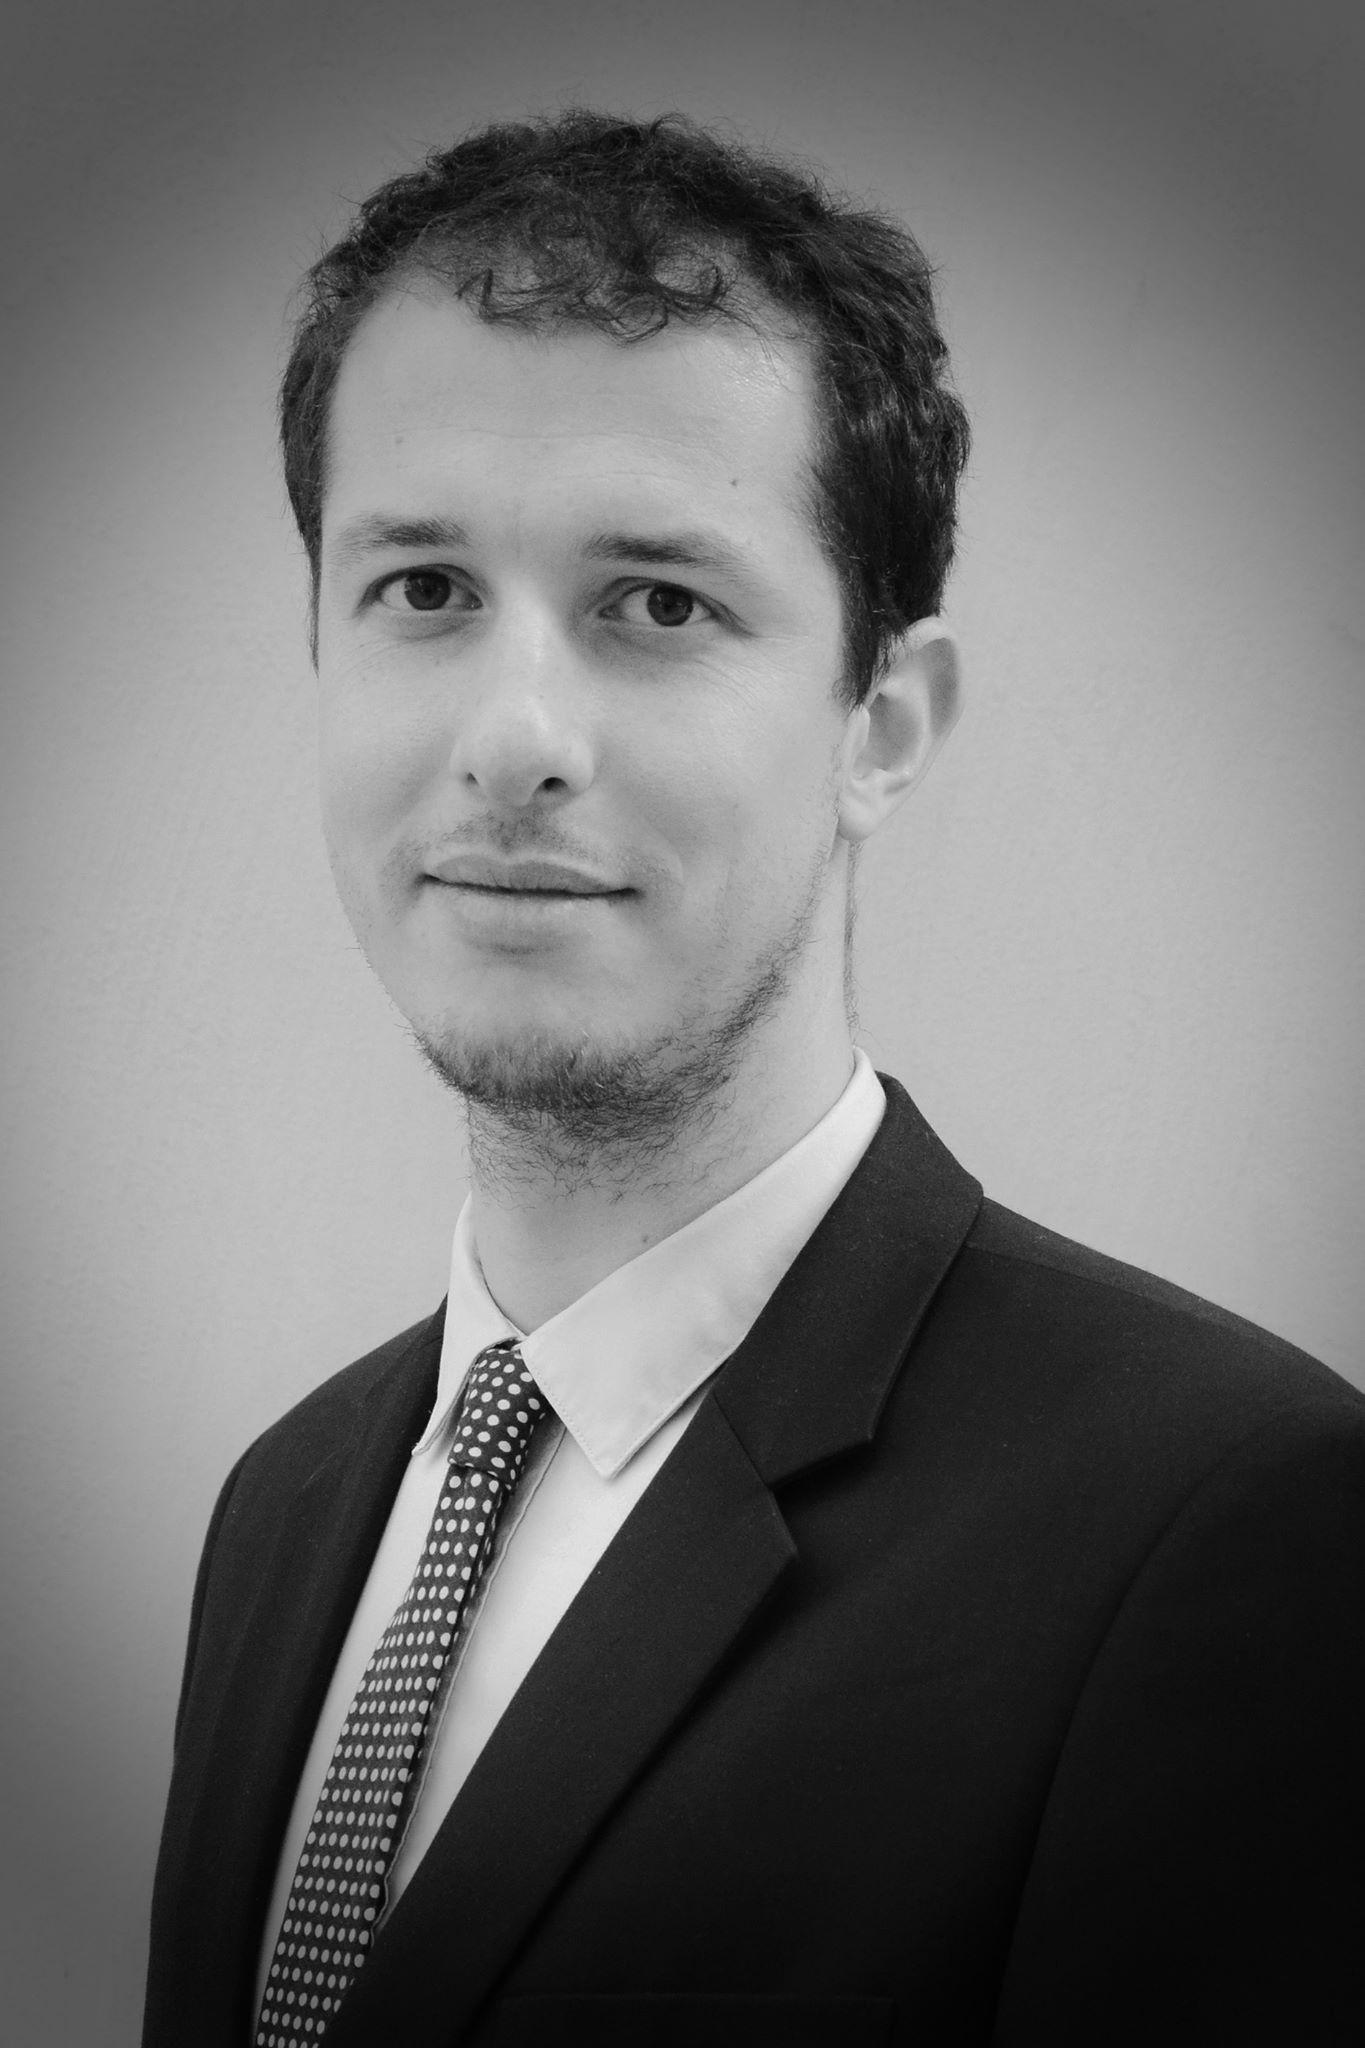 Mgr. Daniel Džmuráň, Associate